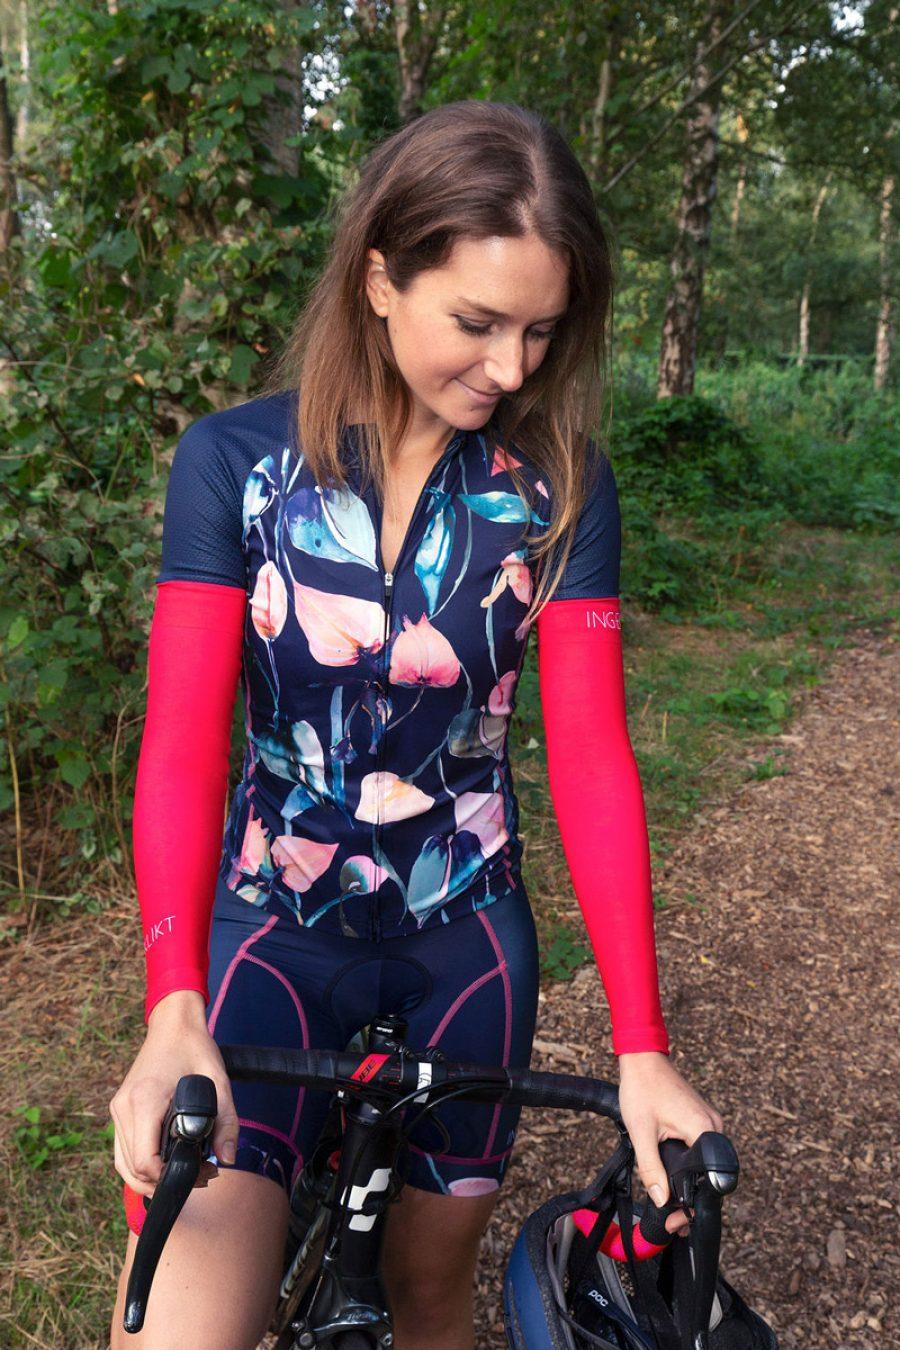 armstukken-wielrennen-dames-roze